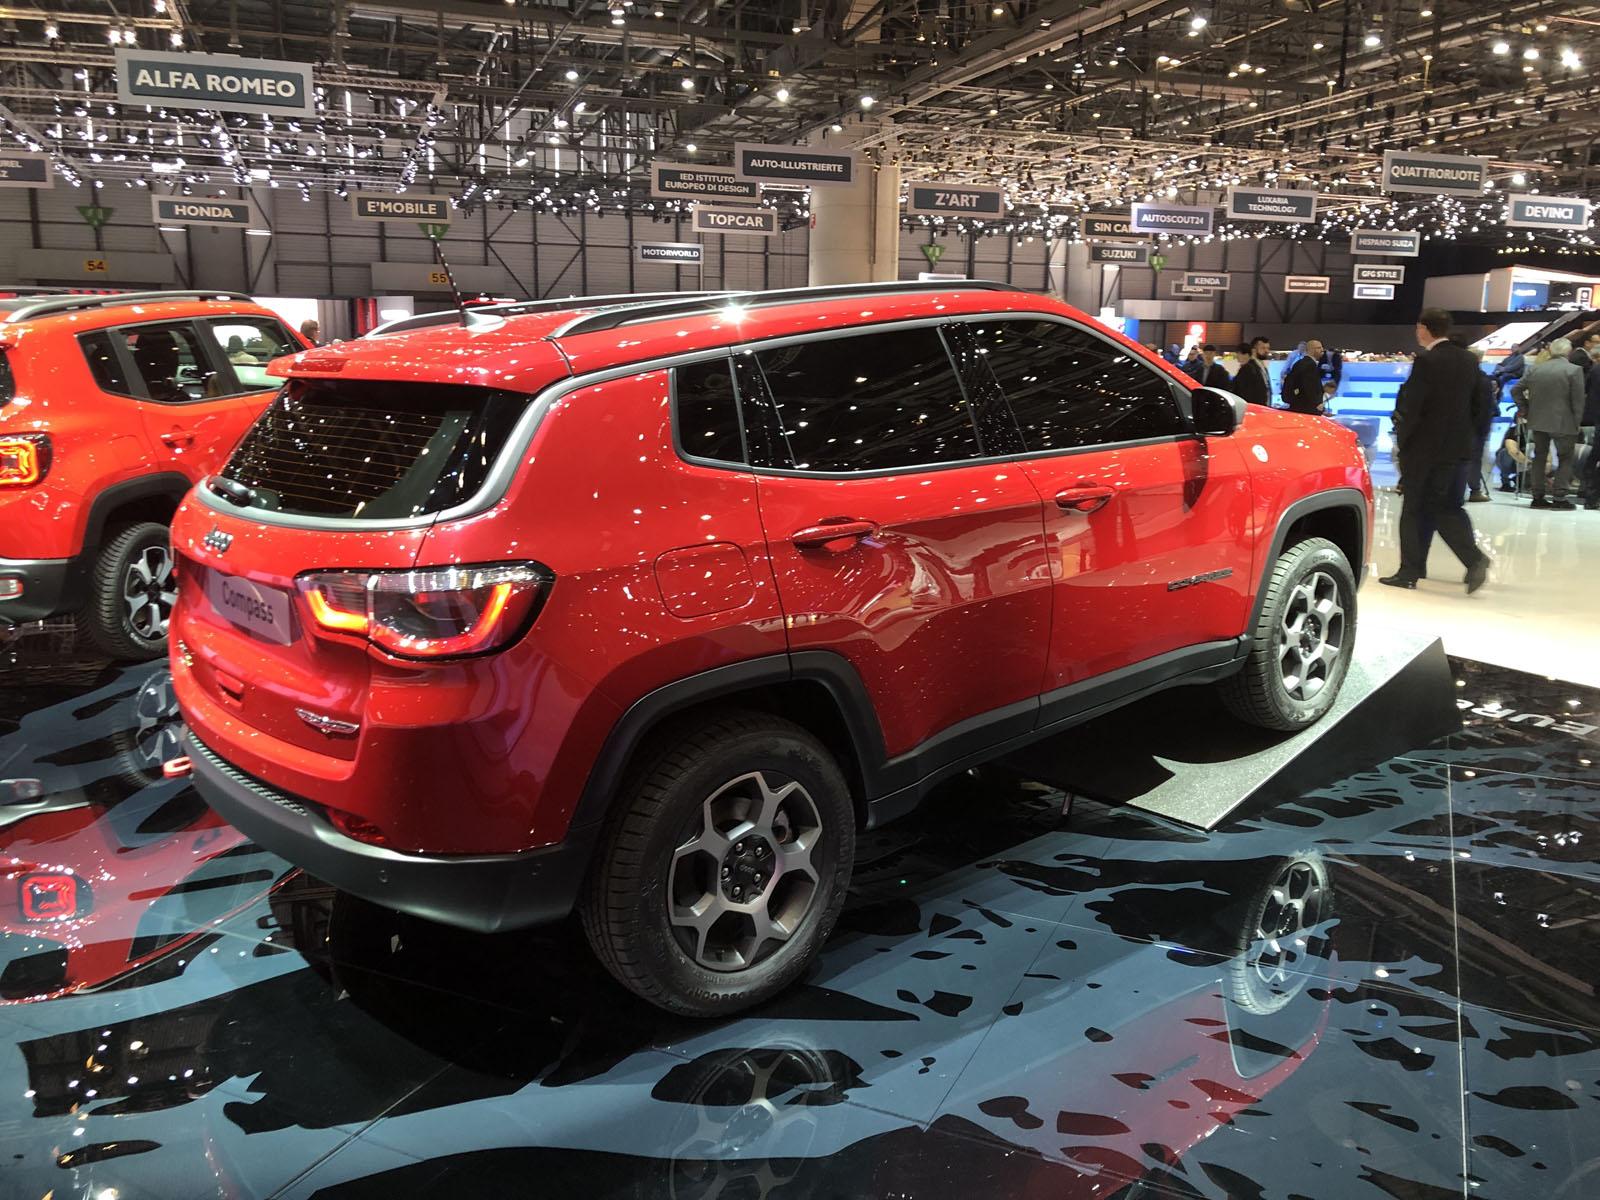 alfa romeo tonale  jeep compass phev lead big geneva motor show for fca